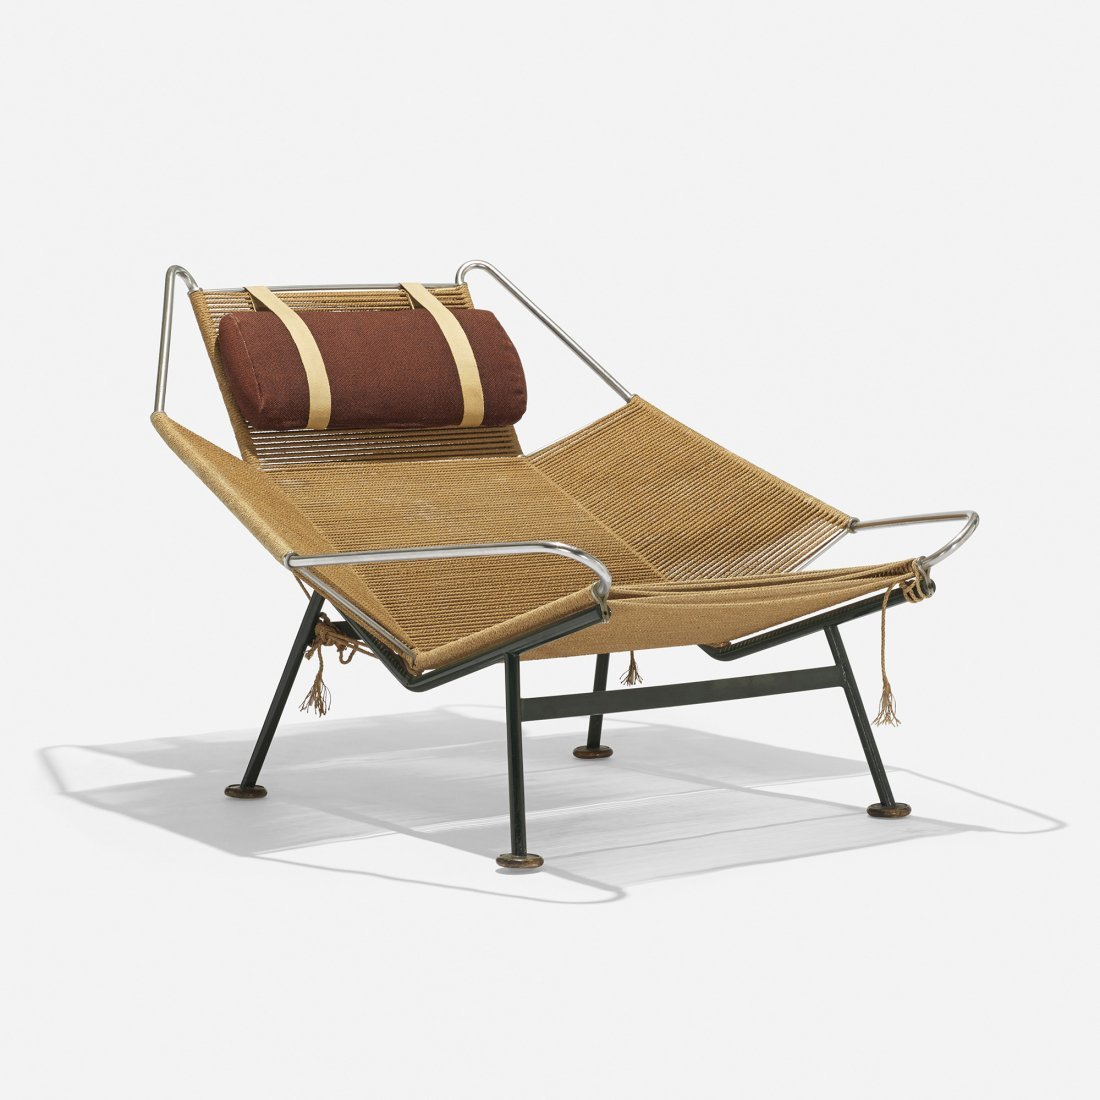 Hans Wegner Flag Halyard chair